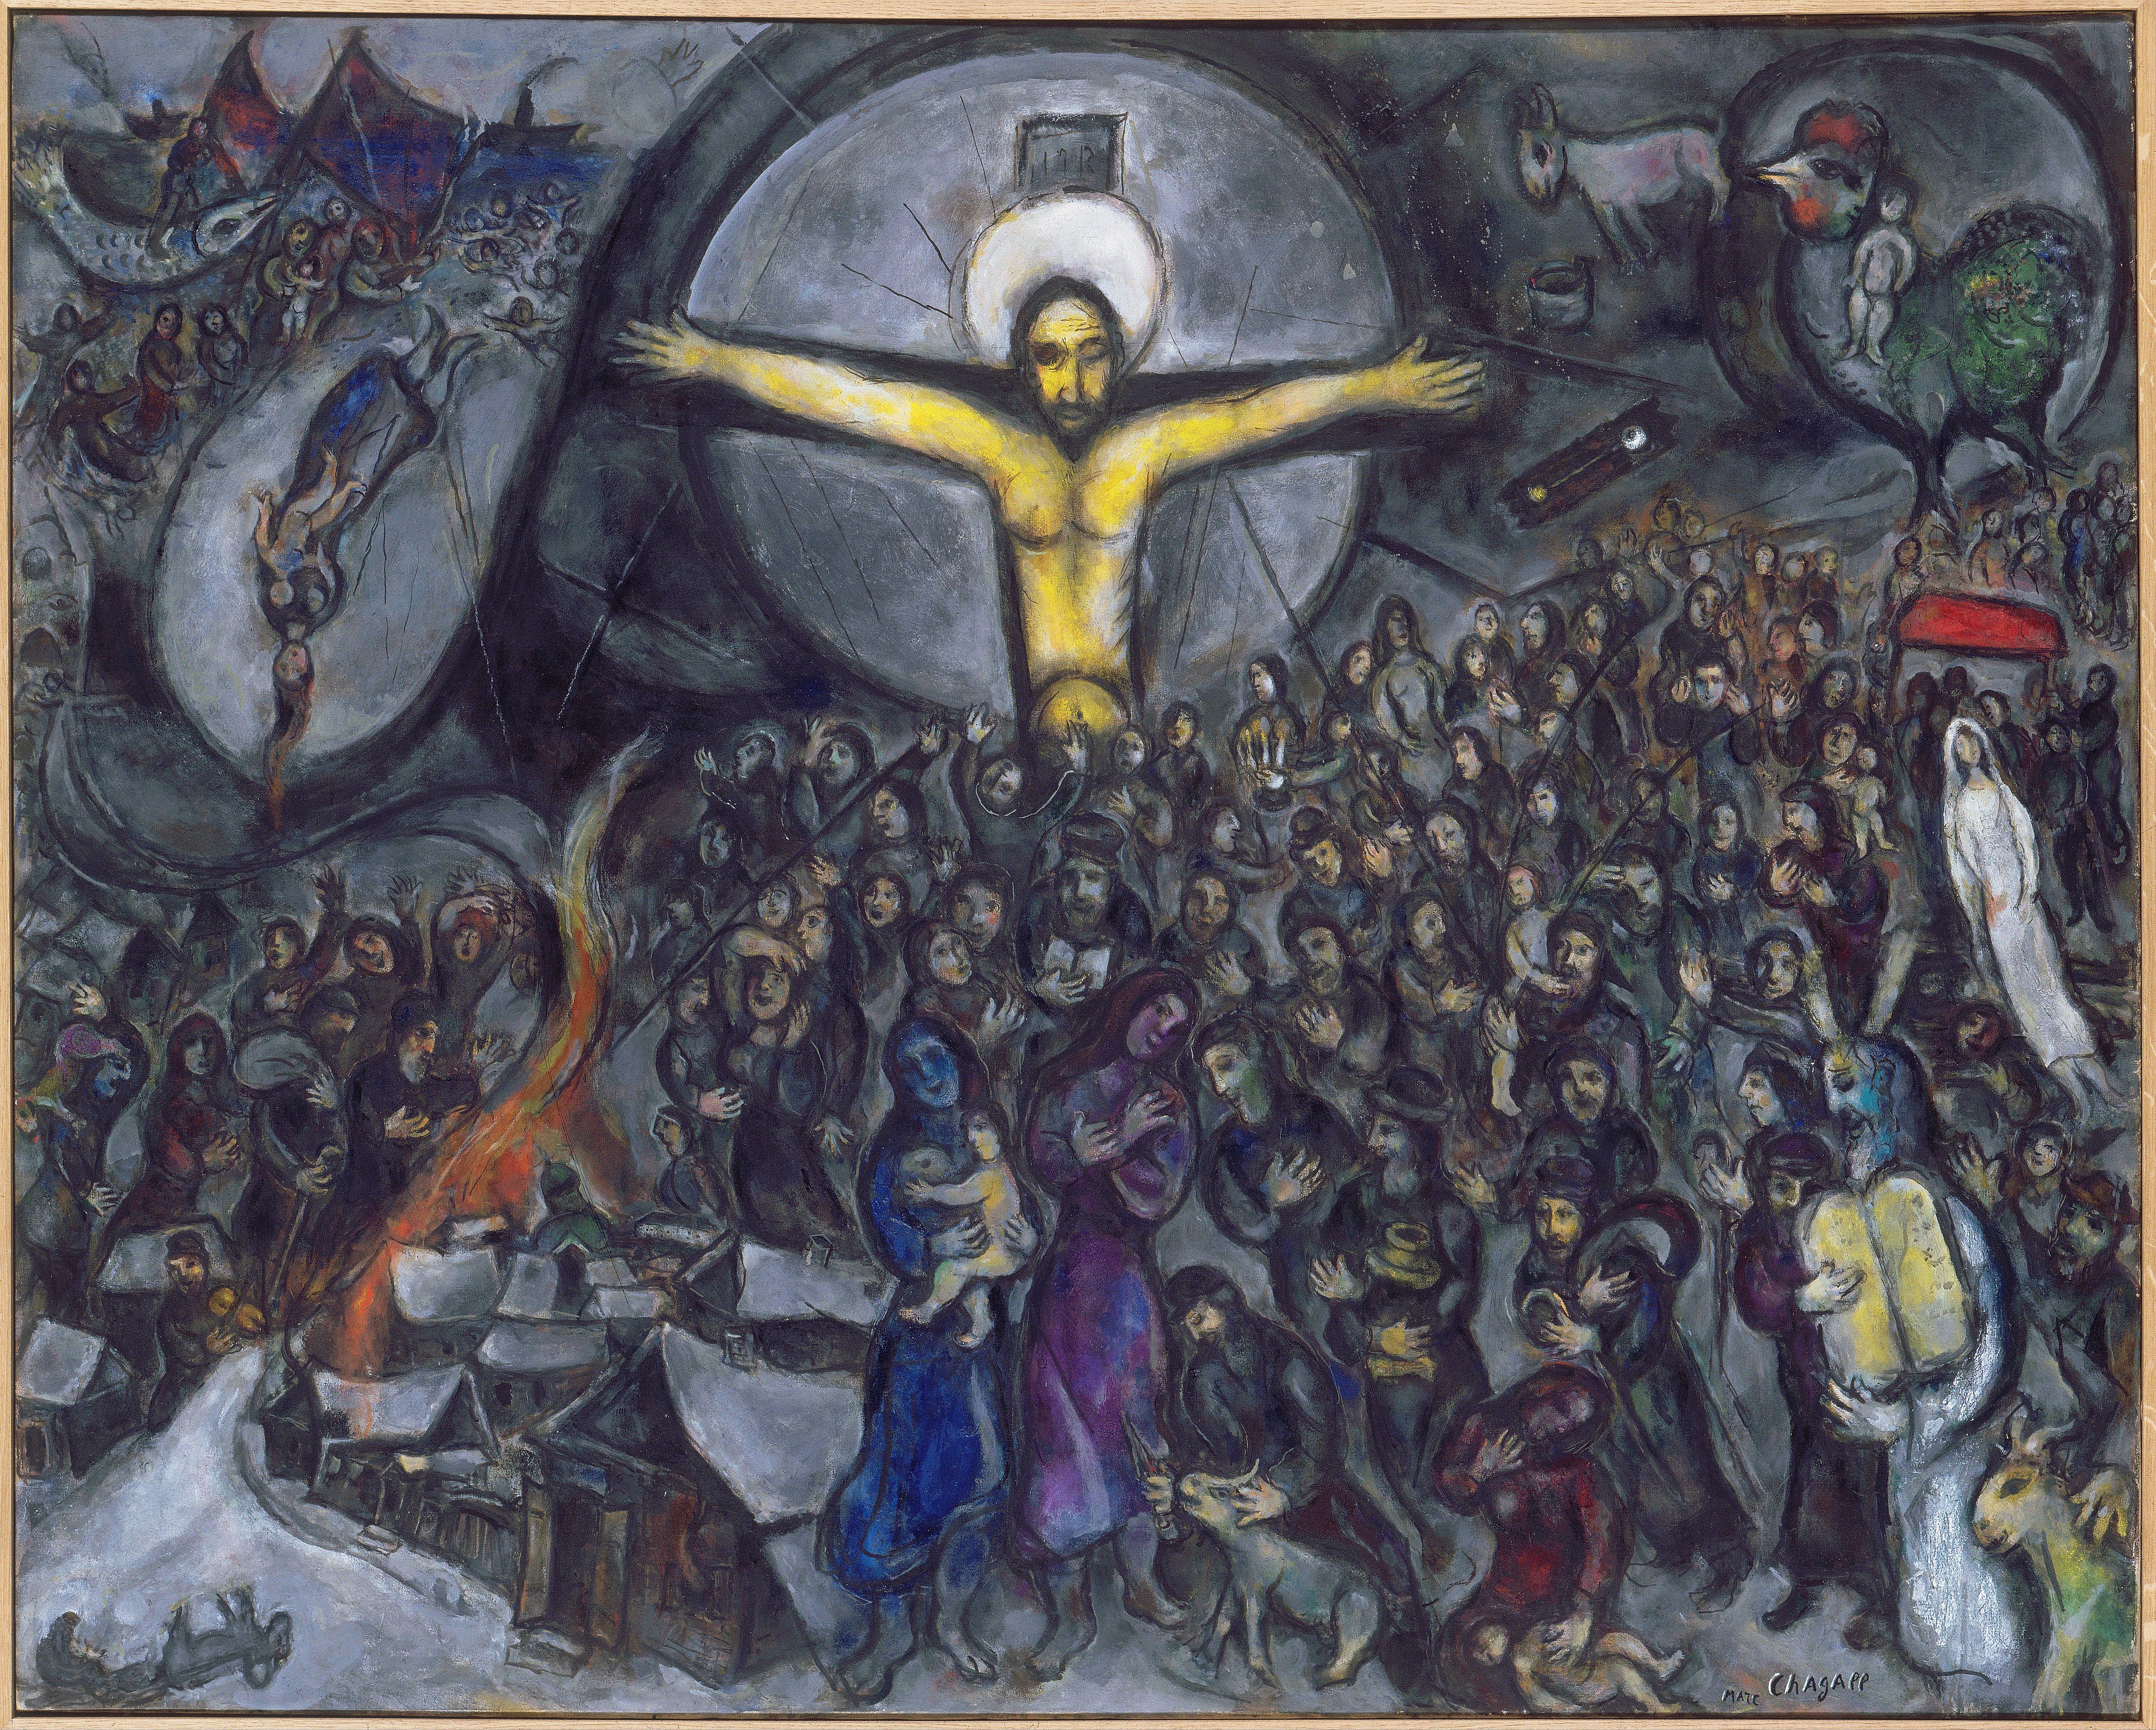 November | 2013 | ORGANIC CATHOLICS Chagall Crucifixion Paintings